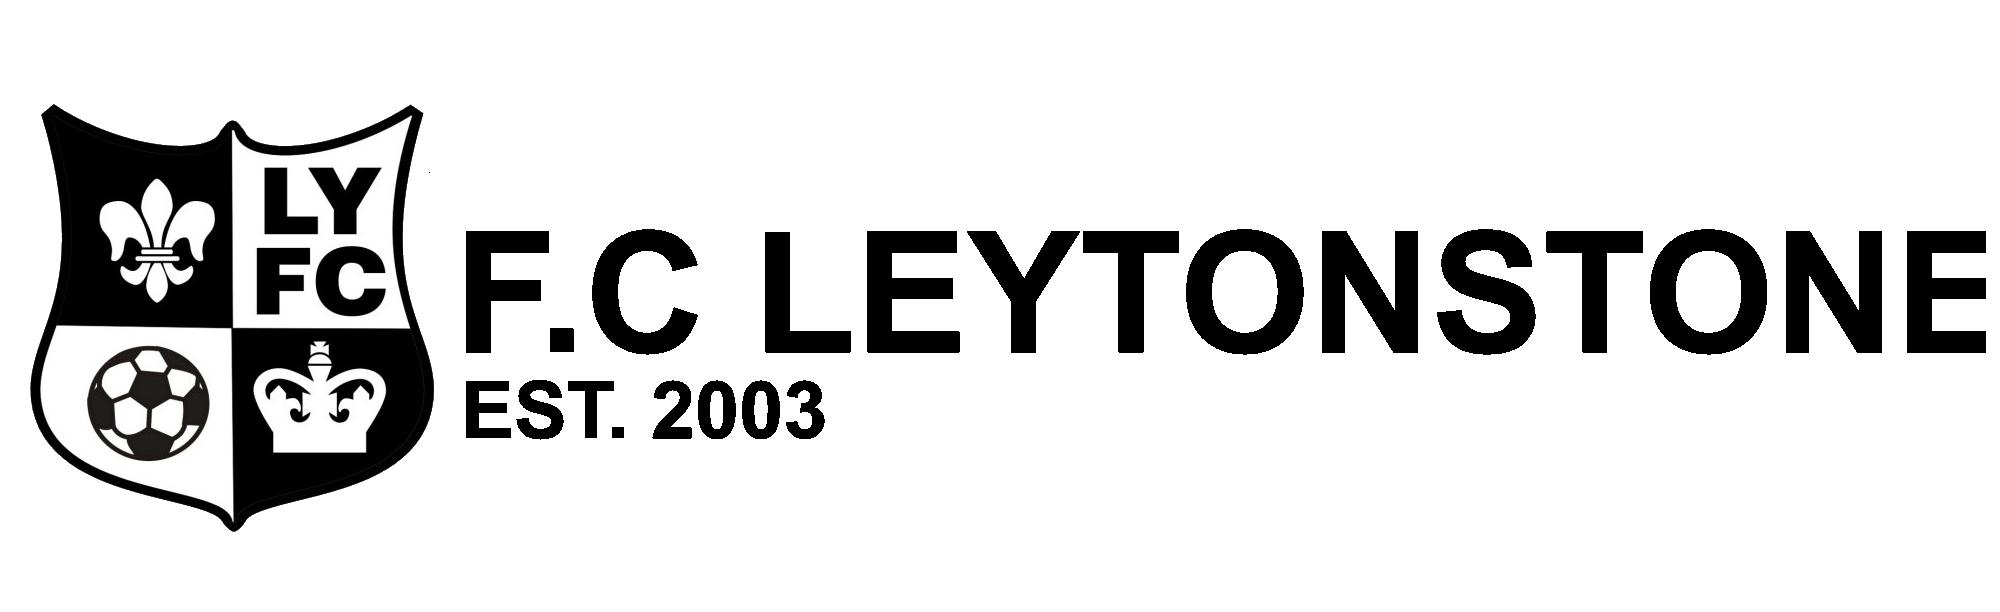 fcleytonstone LONG